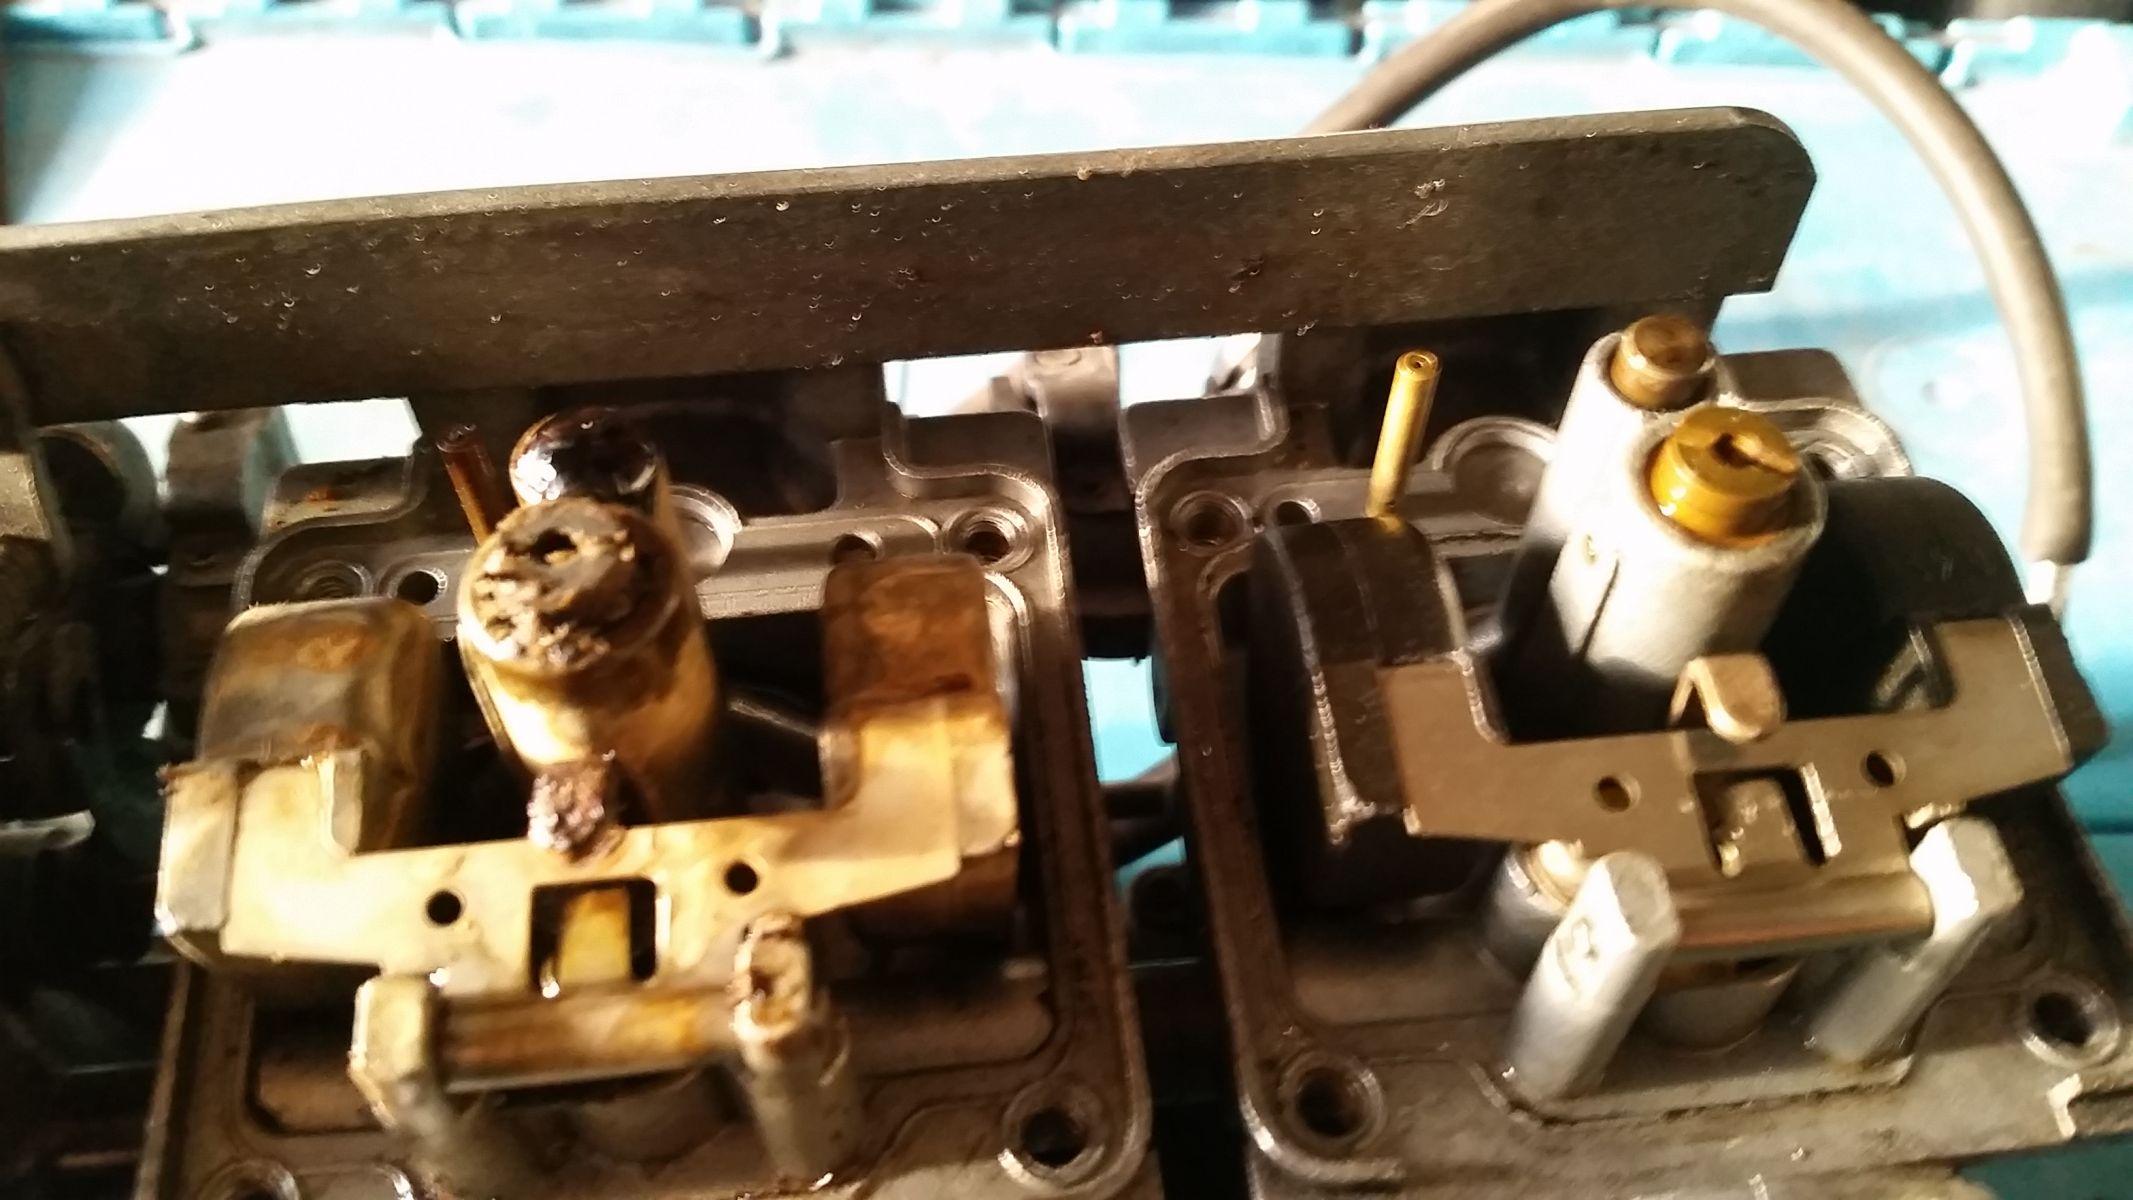 1983 Kz1000p Bobber Build Mutt 3 Kzrider Forum Kz Wiring Harness Uploadfromtaptalk1428019383970